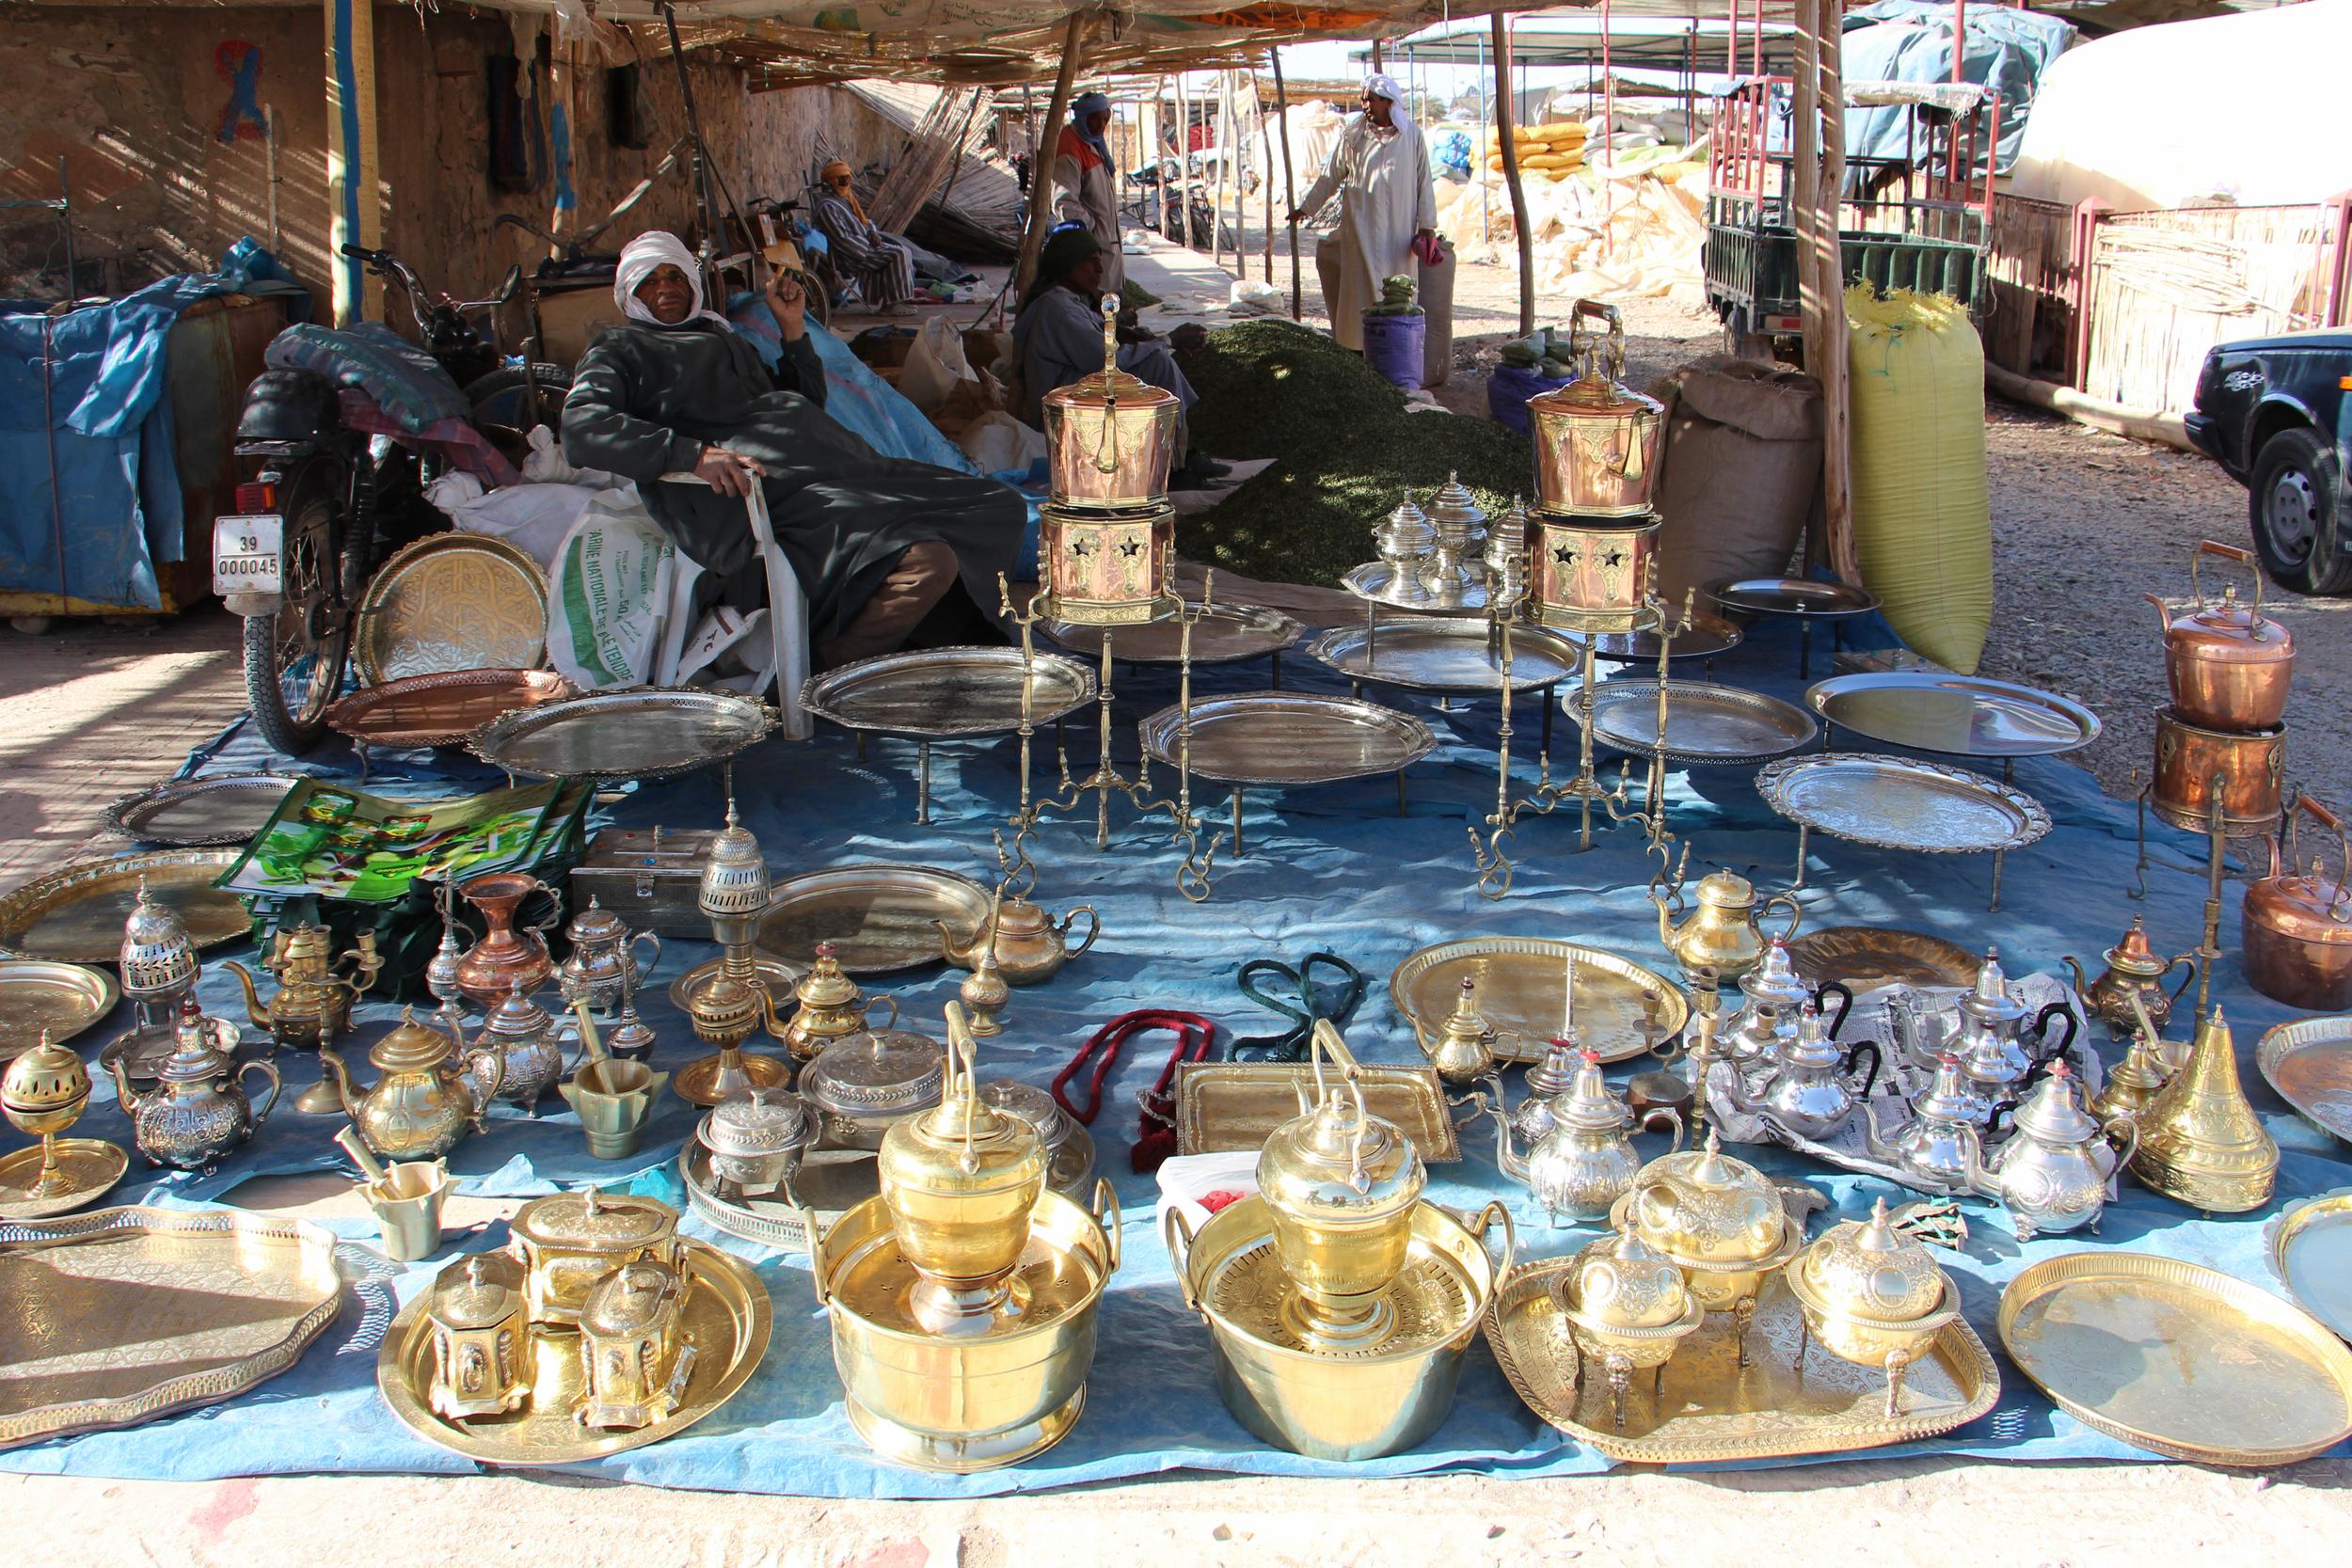 Berber Market Aladdin Lamp